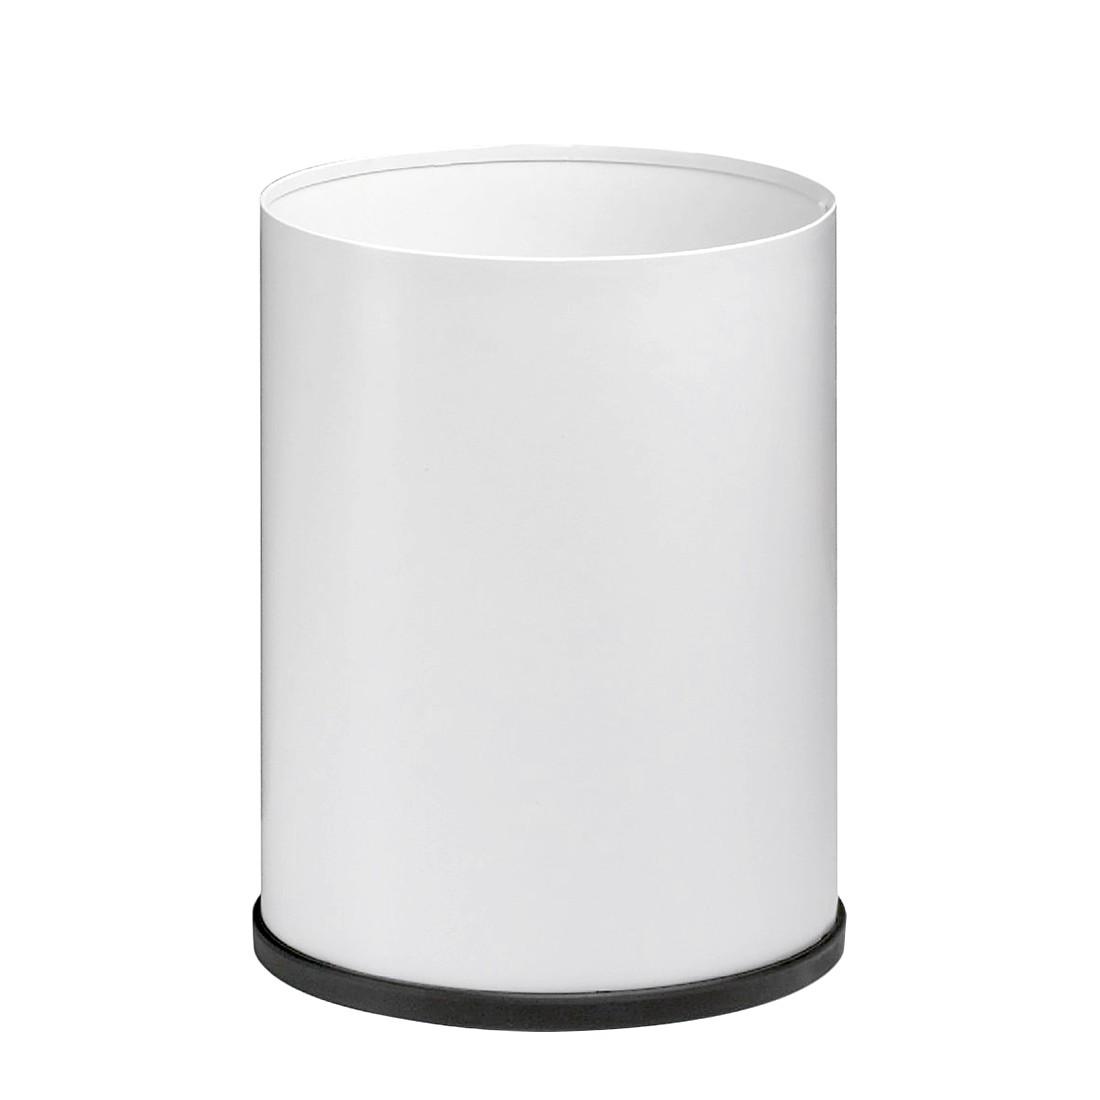 Abfallbehälter Basics – Weiß, Blanke Design günstig kaufen